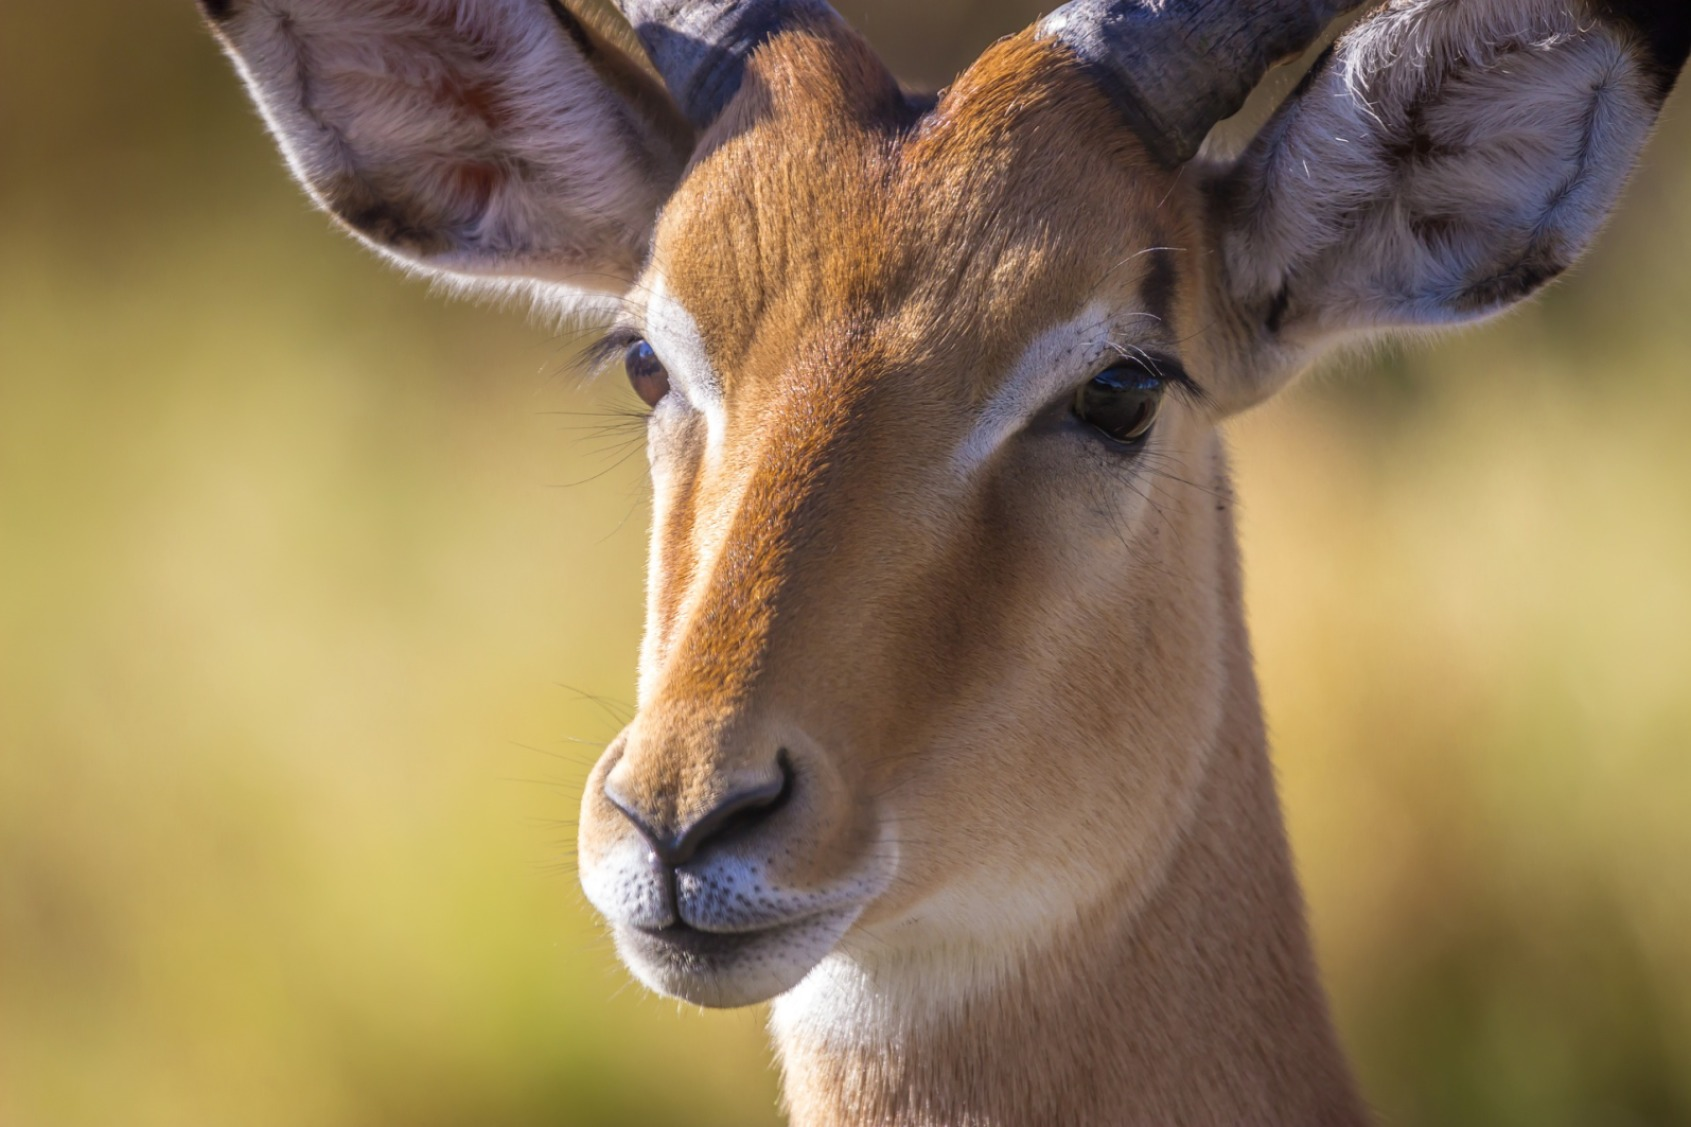 Impala - Original image